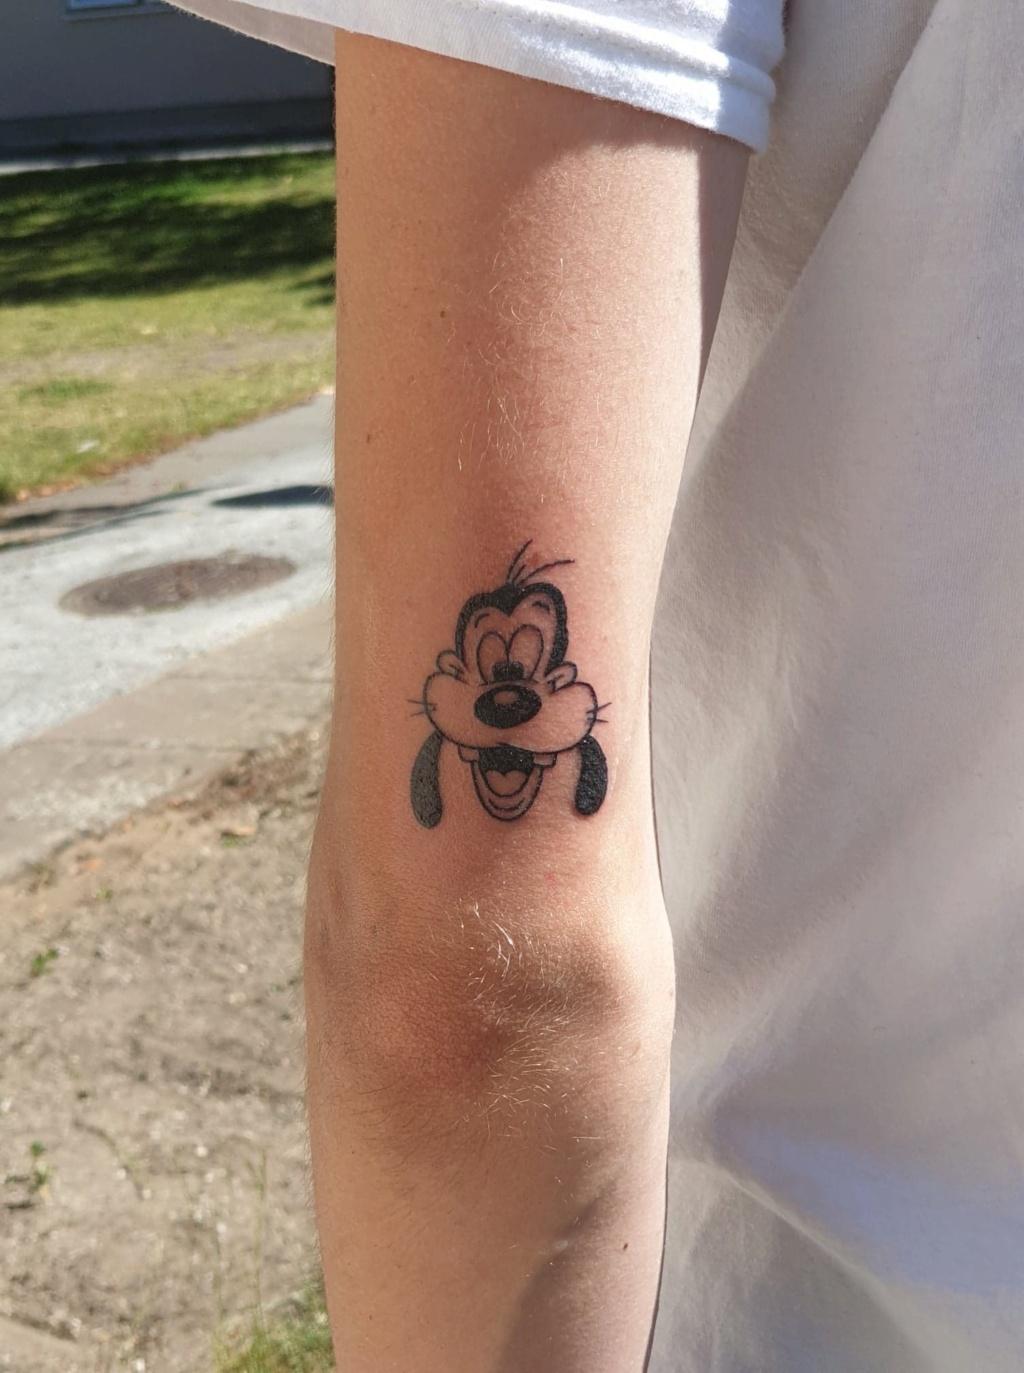 OSRS Advice Ink! Tattoo11